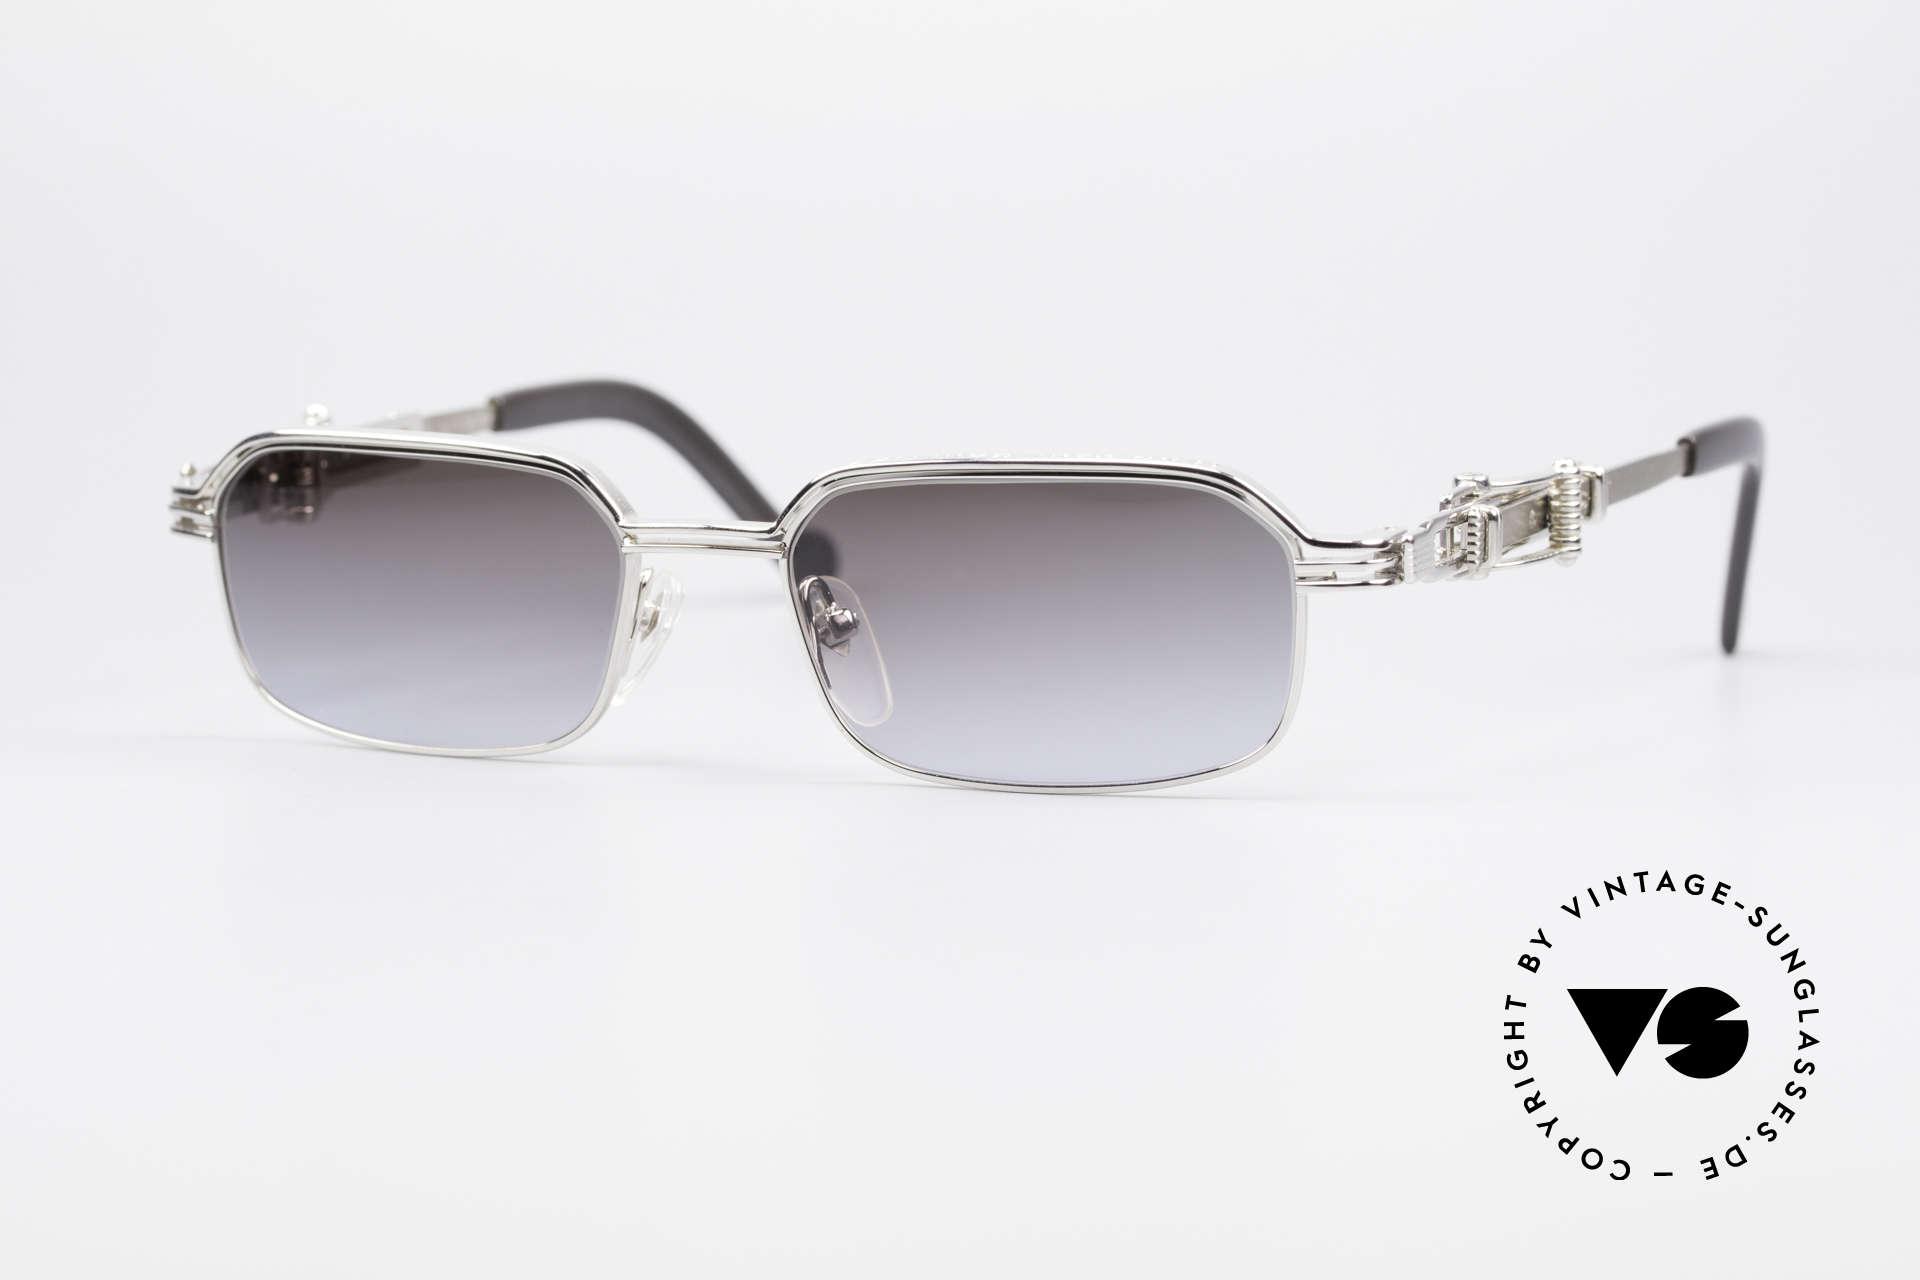 Jean Paul Gaultier 56-0002 Belt Buckle Frame Adjustable, vintage Jean Paul GAULTIER sunglasses from 1996, Made for Men